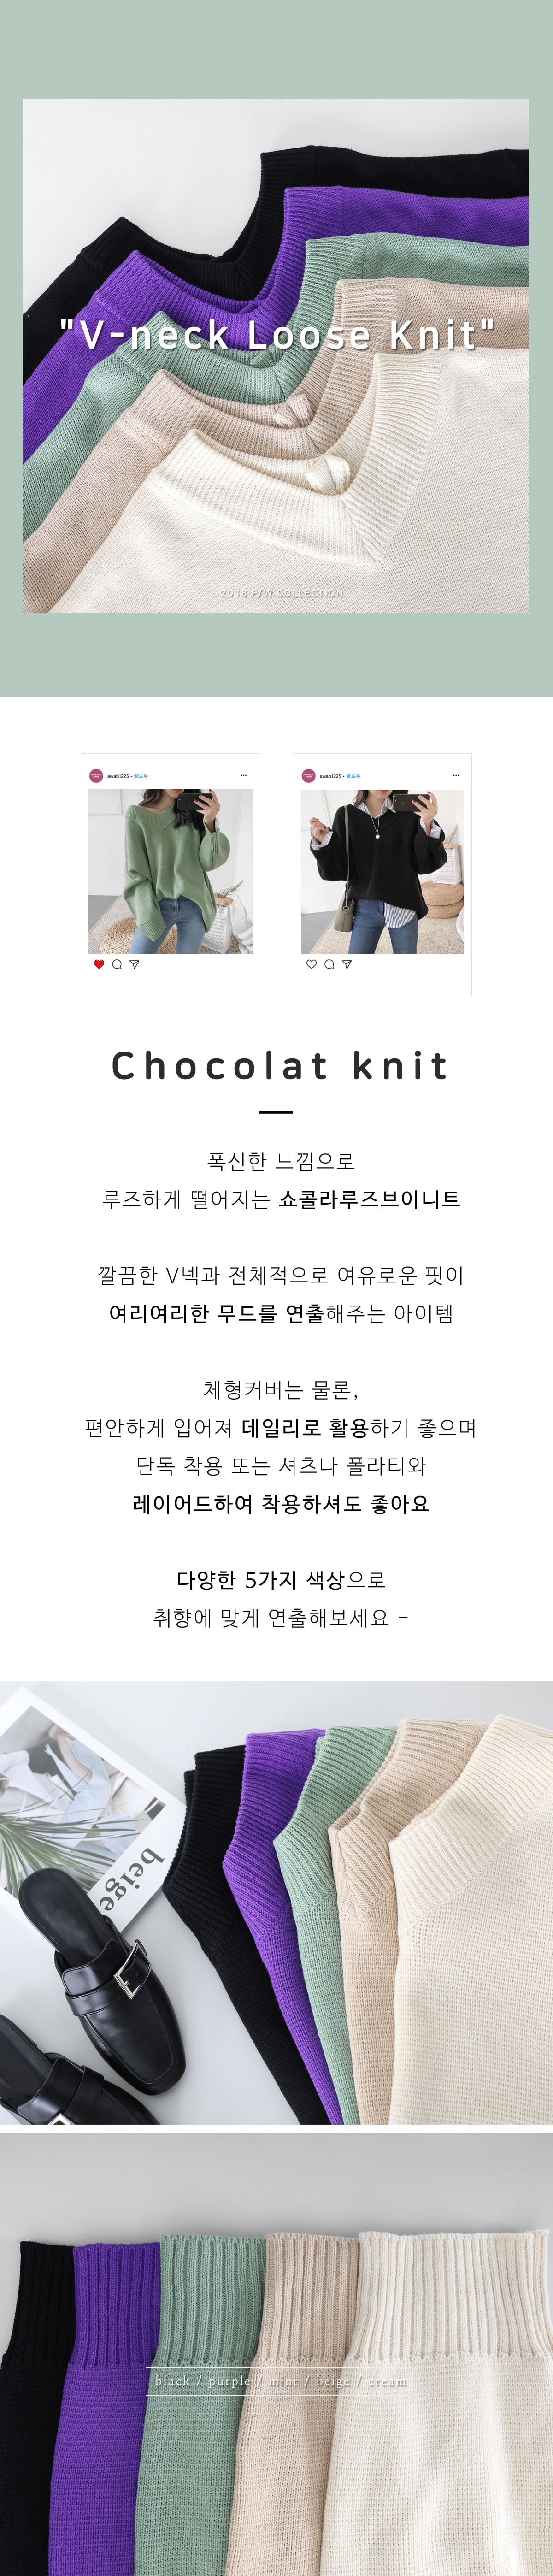 Chocolat rouge knit